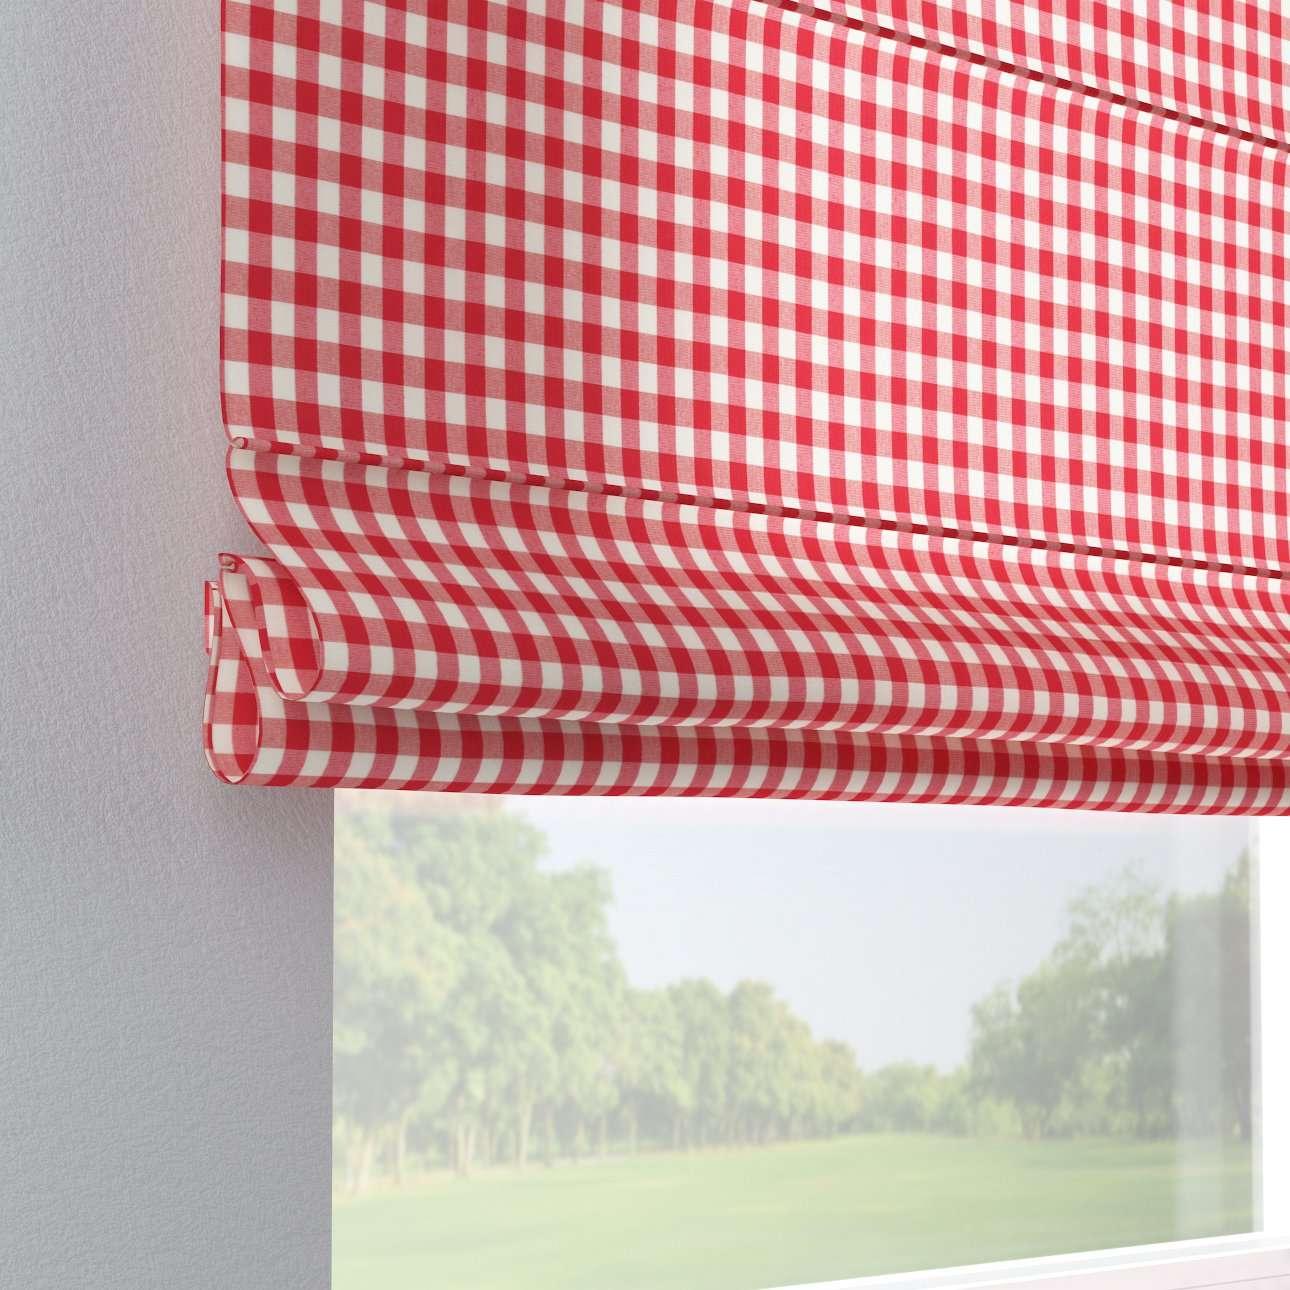 Capri roman blind in collection Quadro, fabric: 136-16